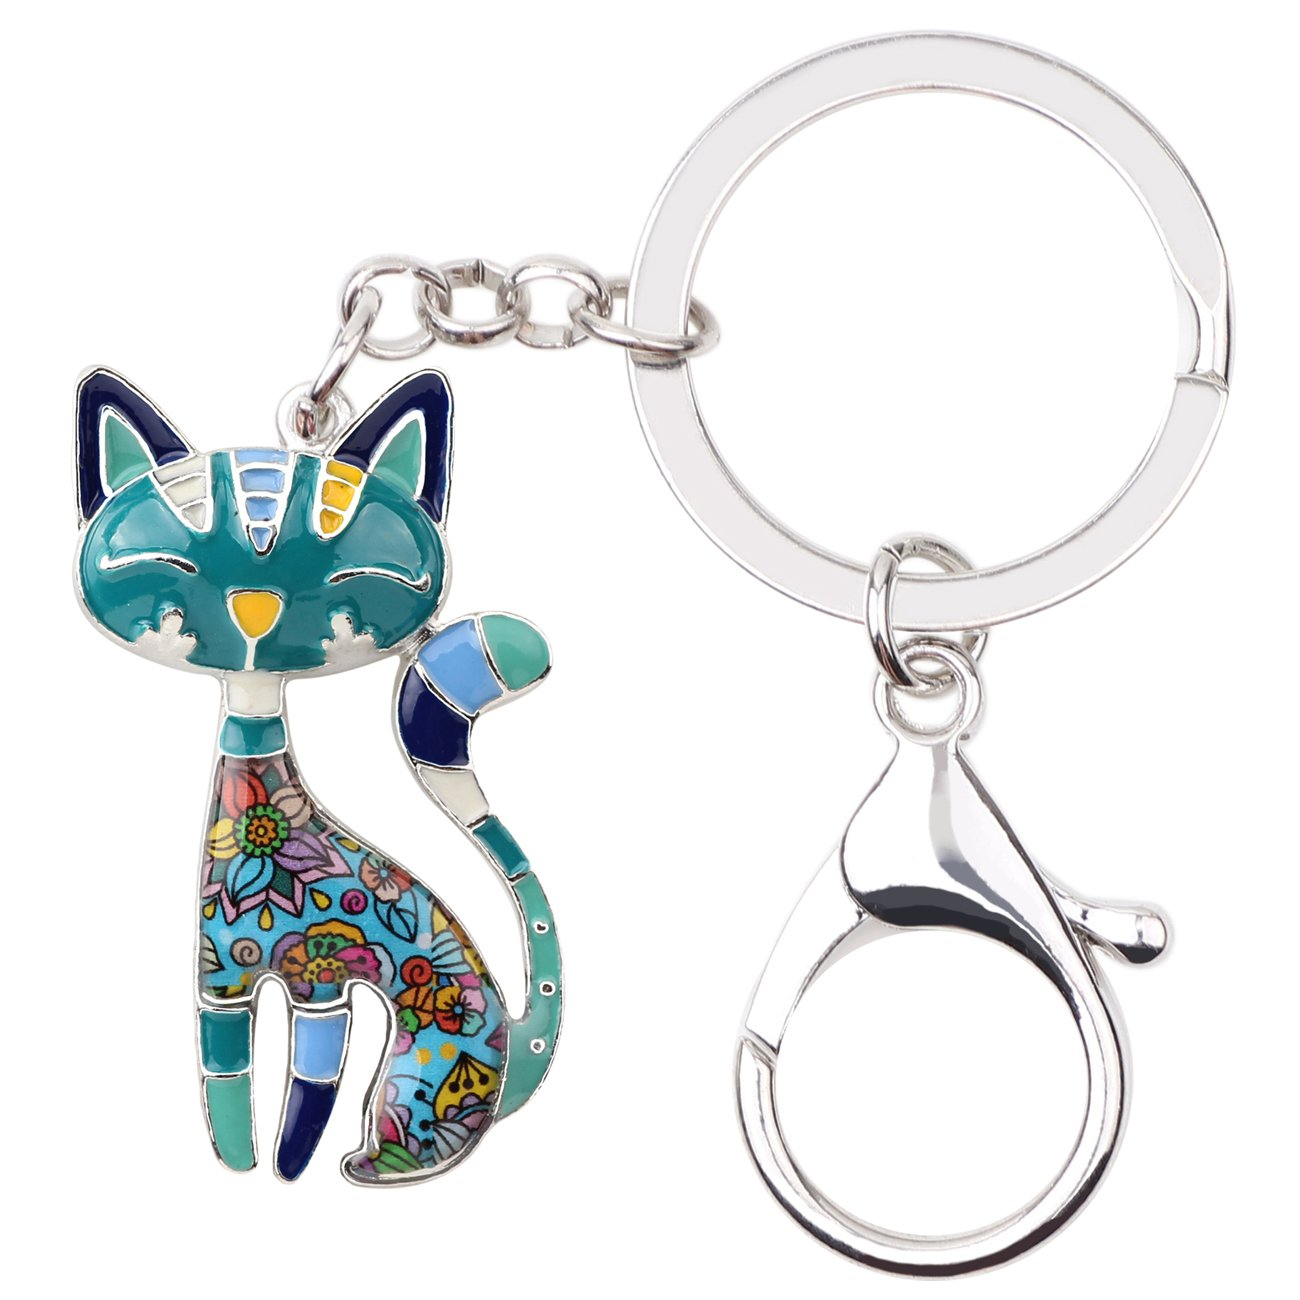 Bonsny Enamel Alloy Chain Cat Key Chains For Women Car Purse Handbag Charms (Blue)